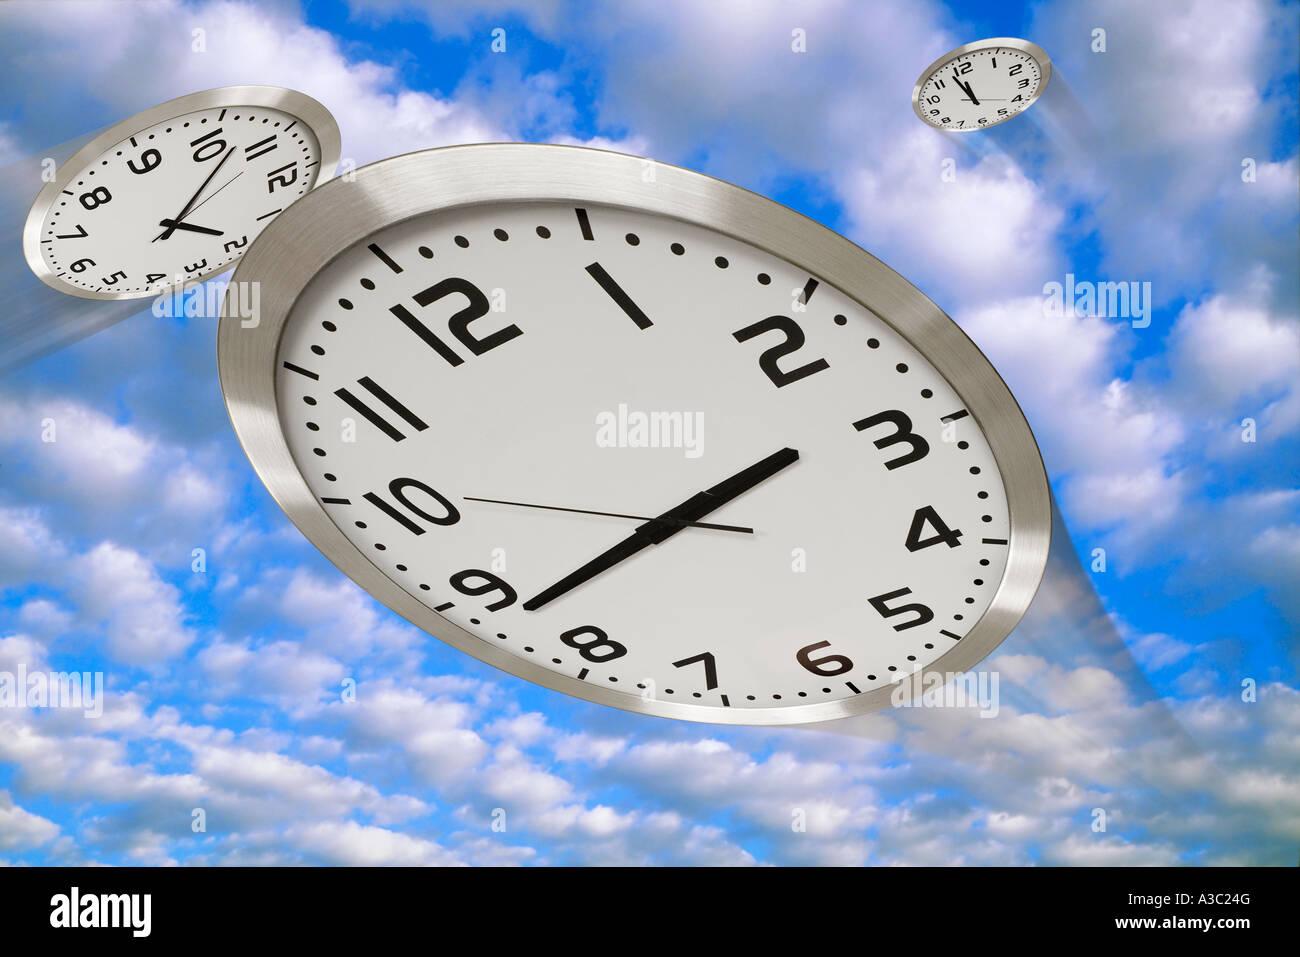 Clocks racing across the sky portraying the slogan Time Flies - Stock Image